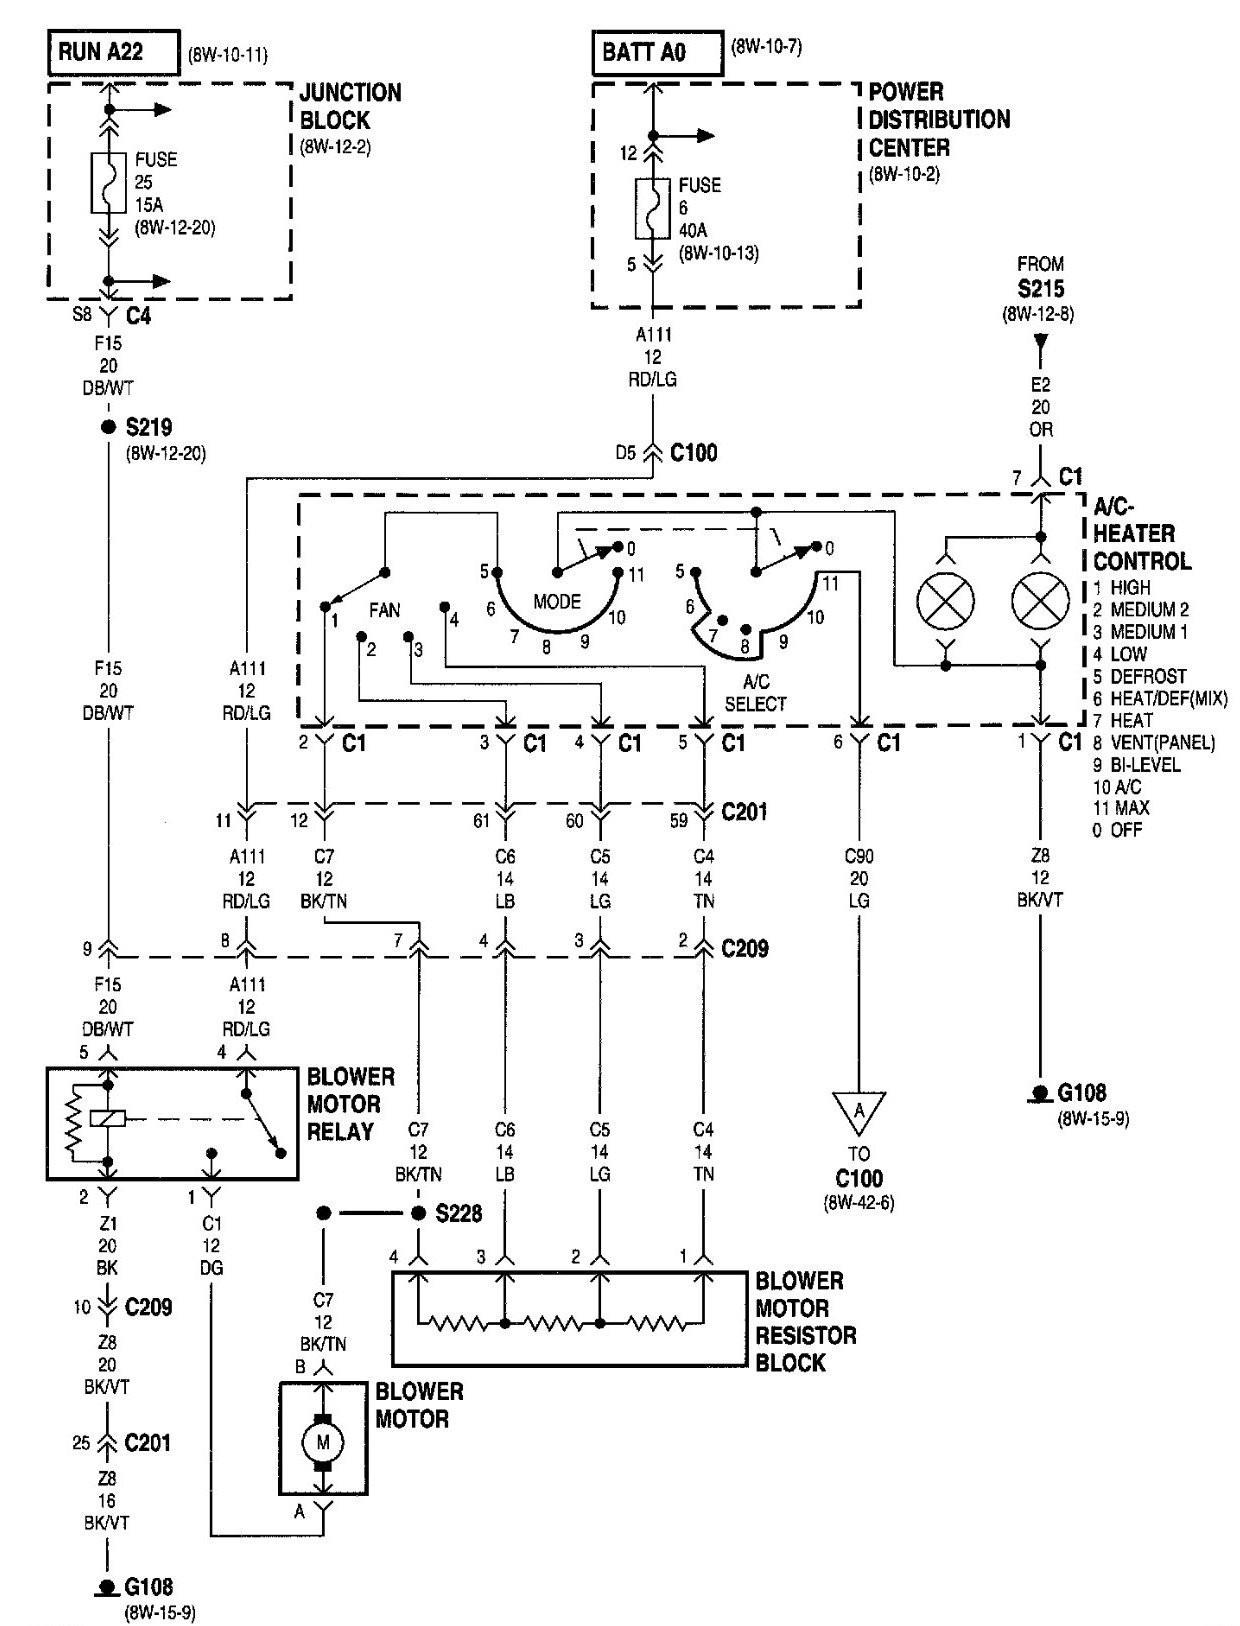 2000 jeep grand cherokee wiring diagram unique wiring diagram image 1995 jeep yj wiring diagram jeep ignition wiring diagrams